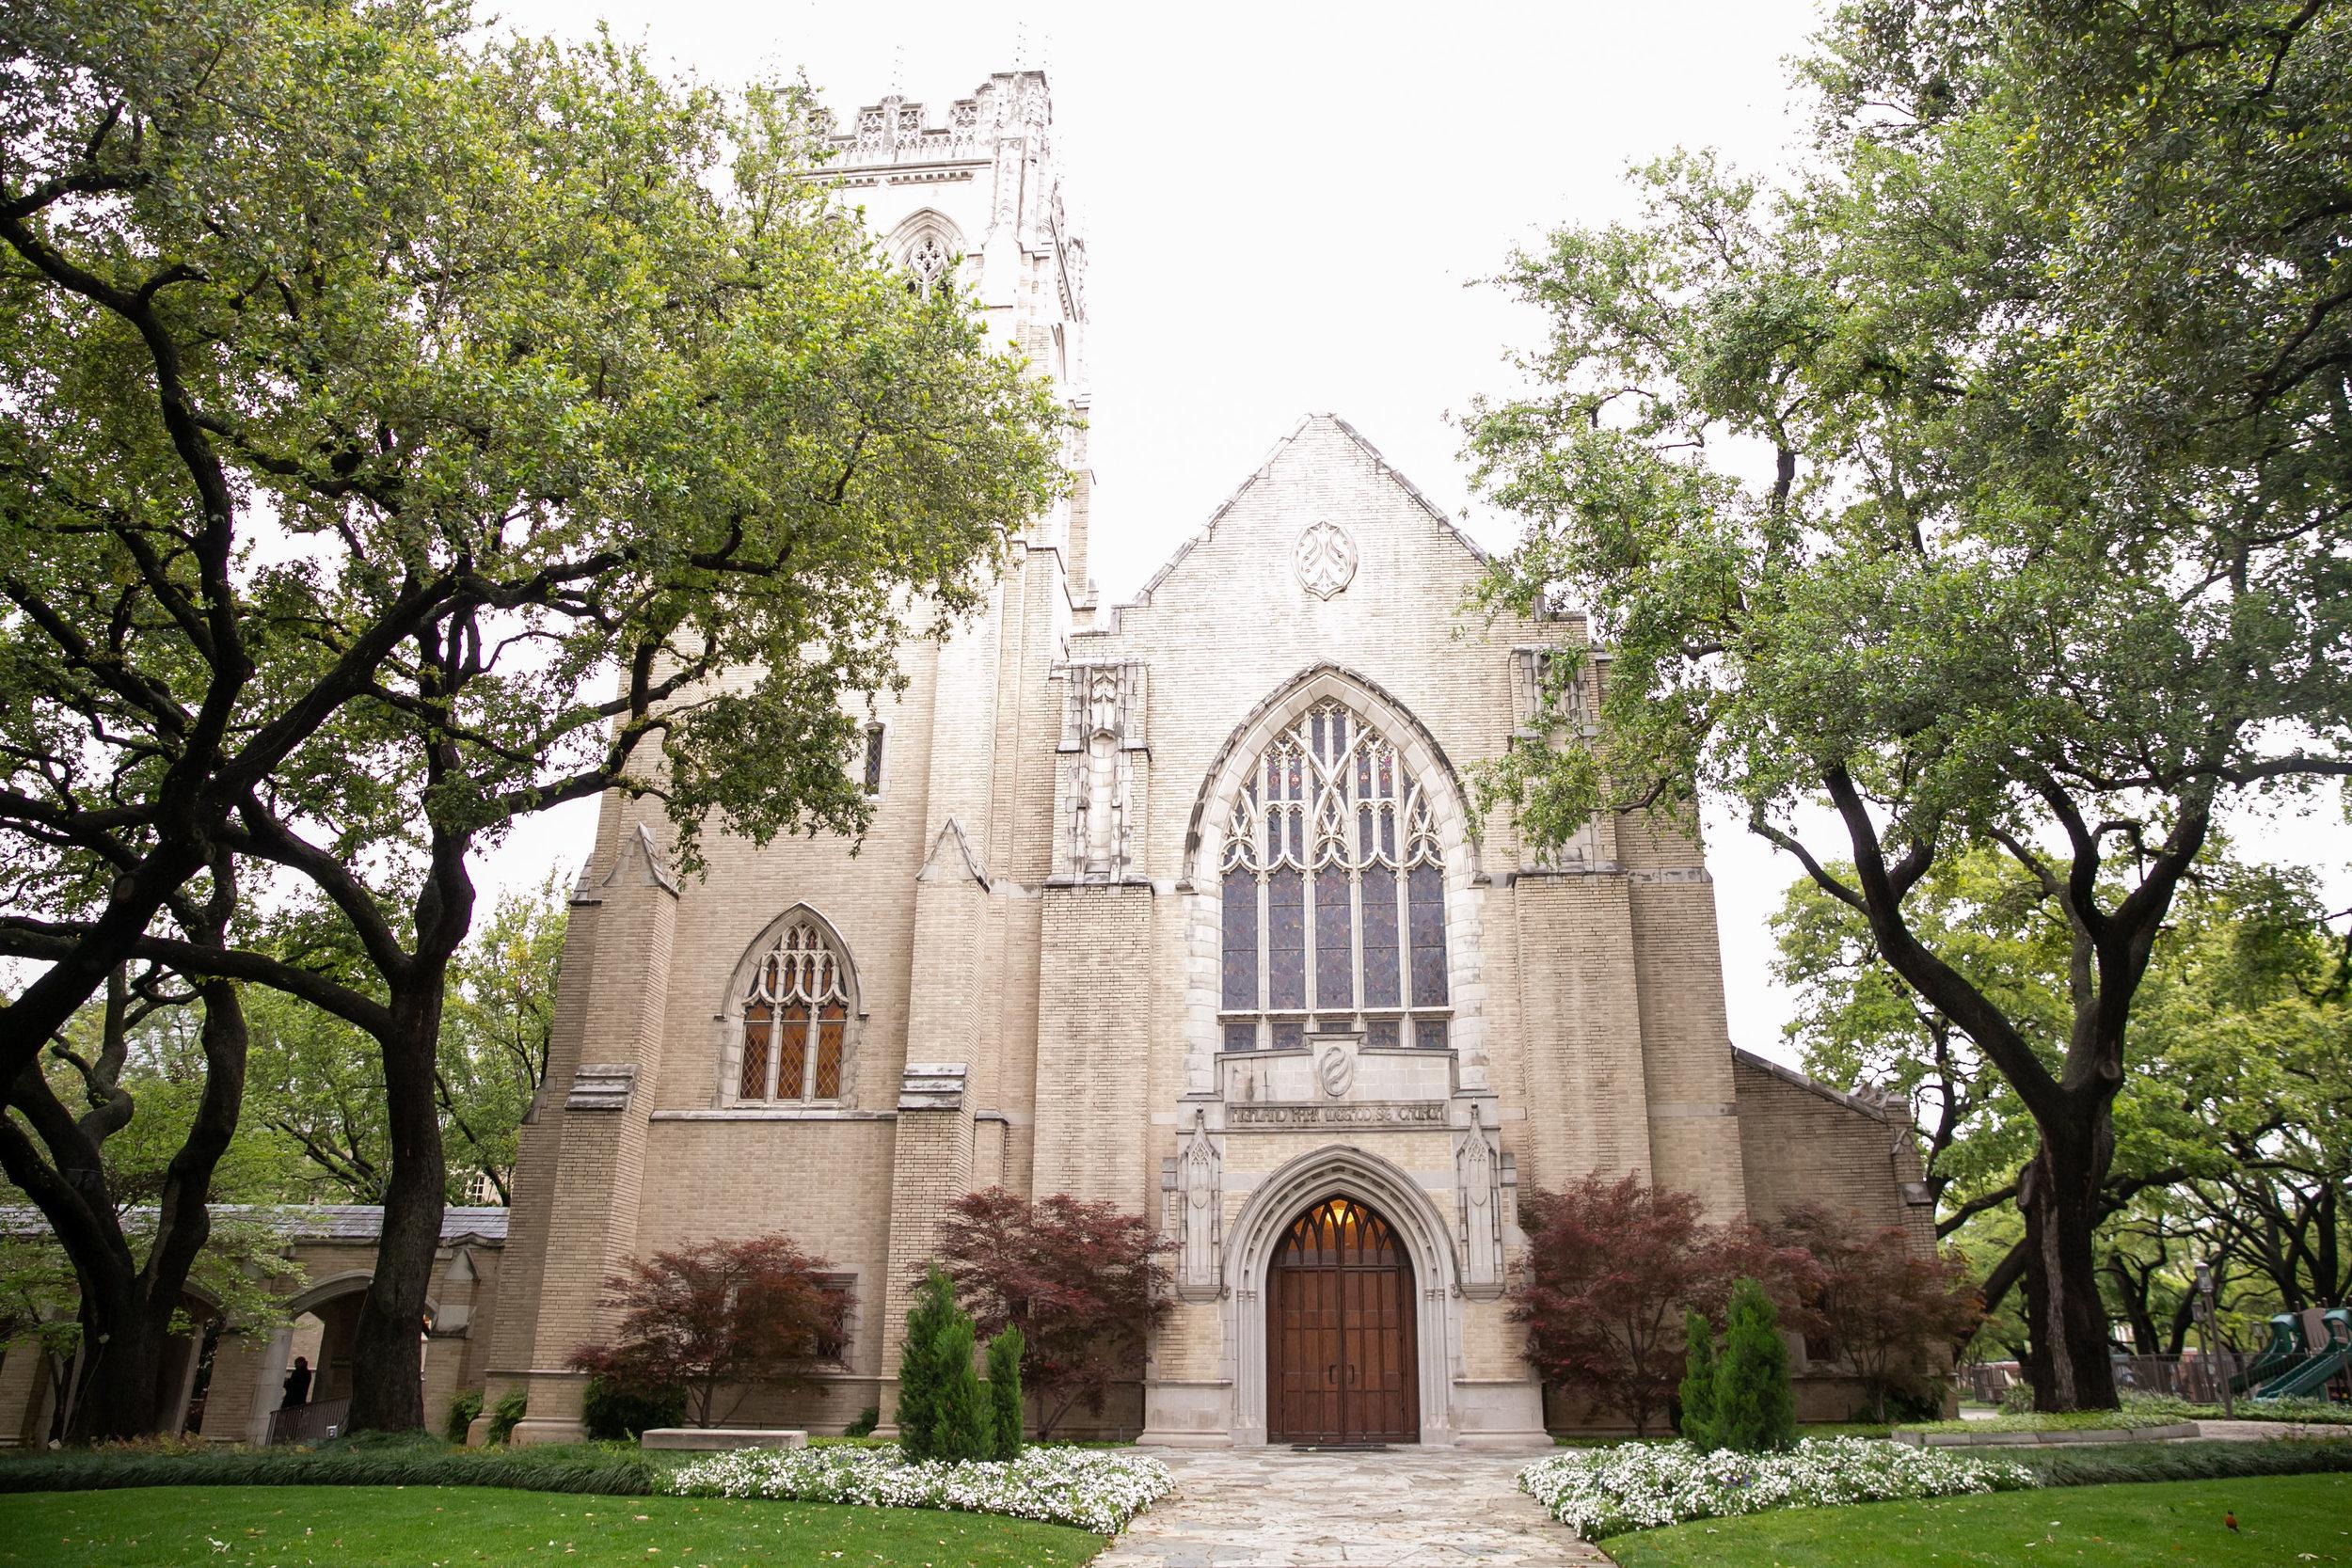 Church Details - Dallas, Texas - Spring Wedding - Julian Leaver Events